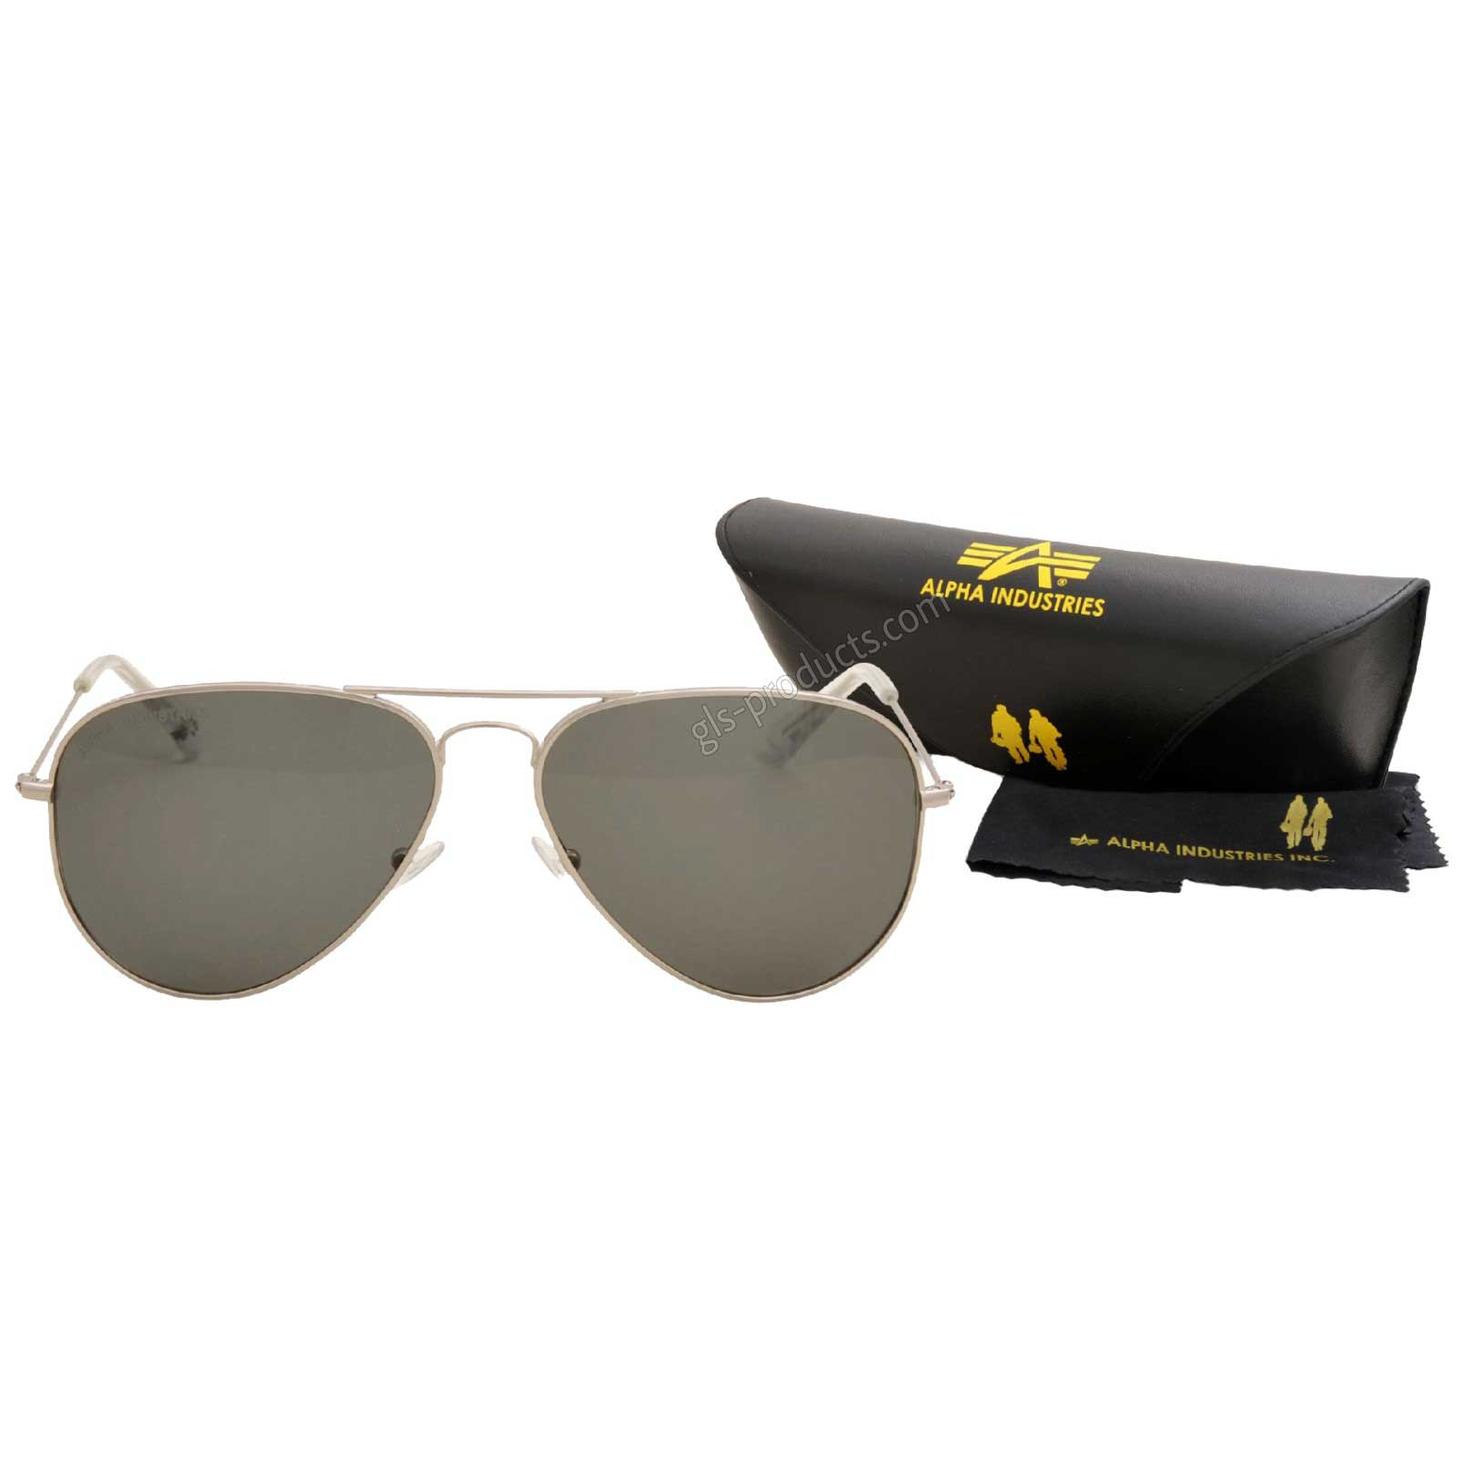 Alpha Industries Top Gun Sunglasses 158903 – Picture 4